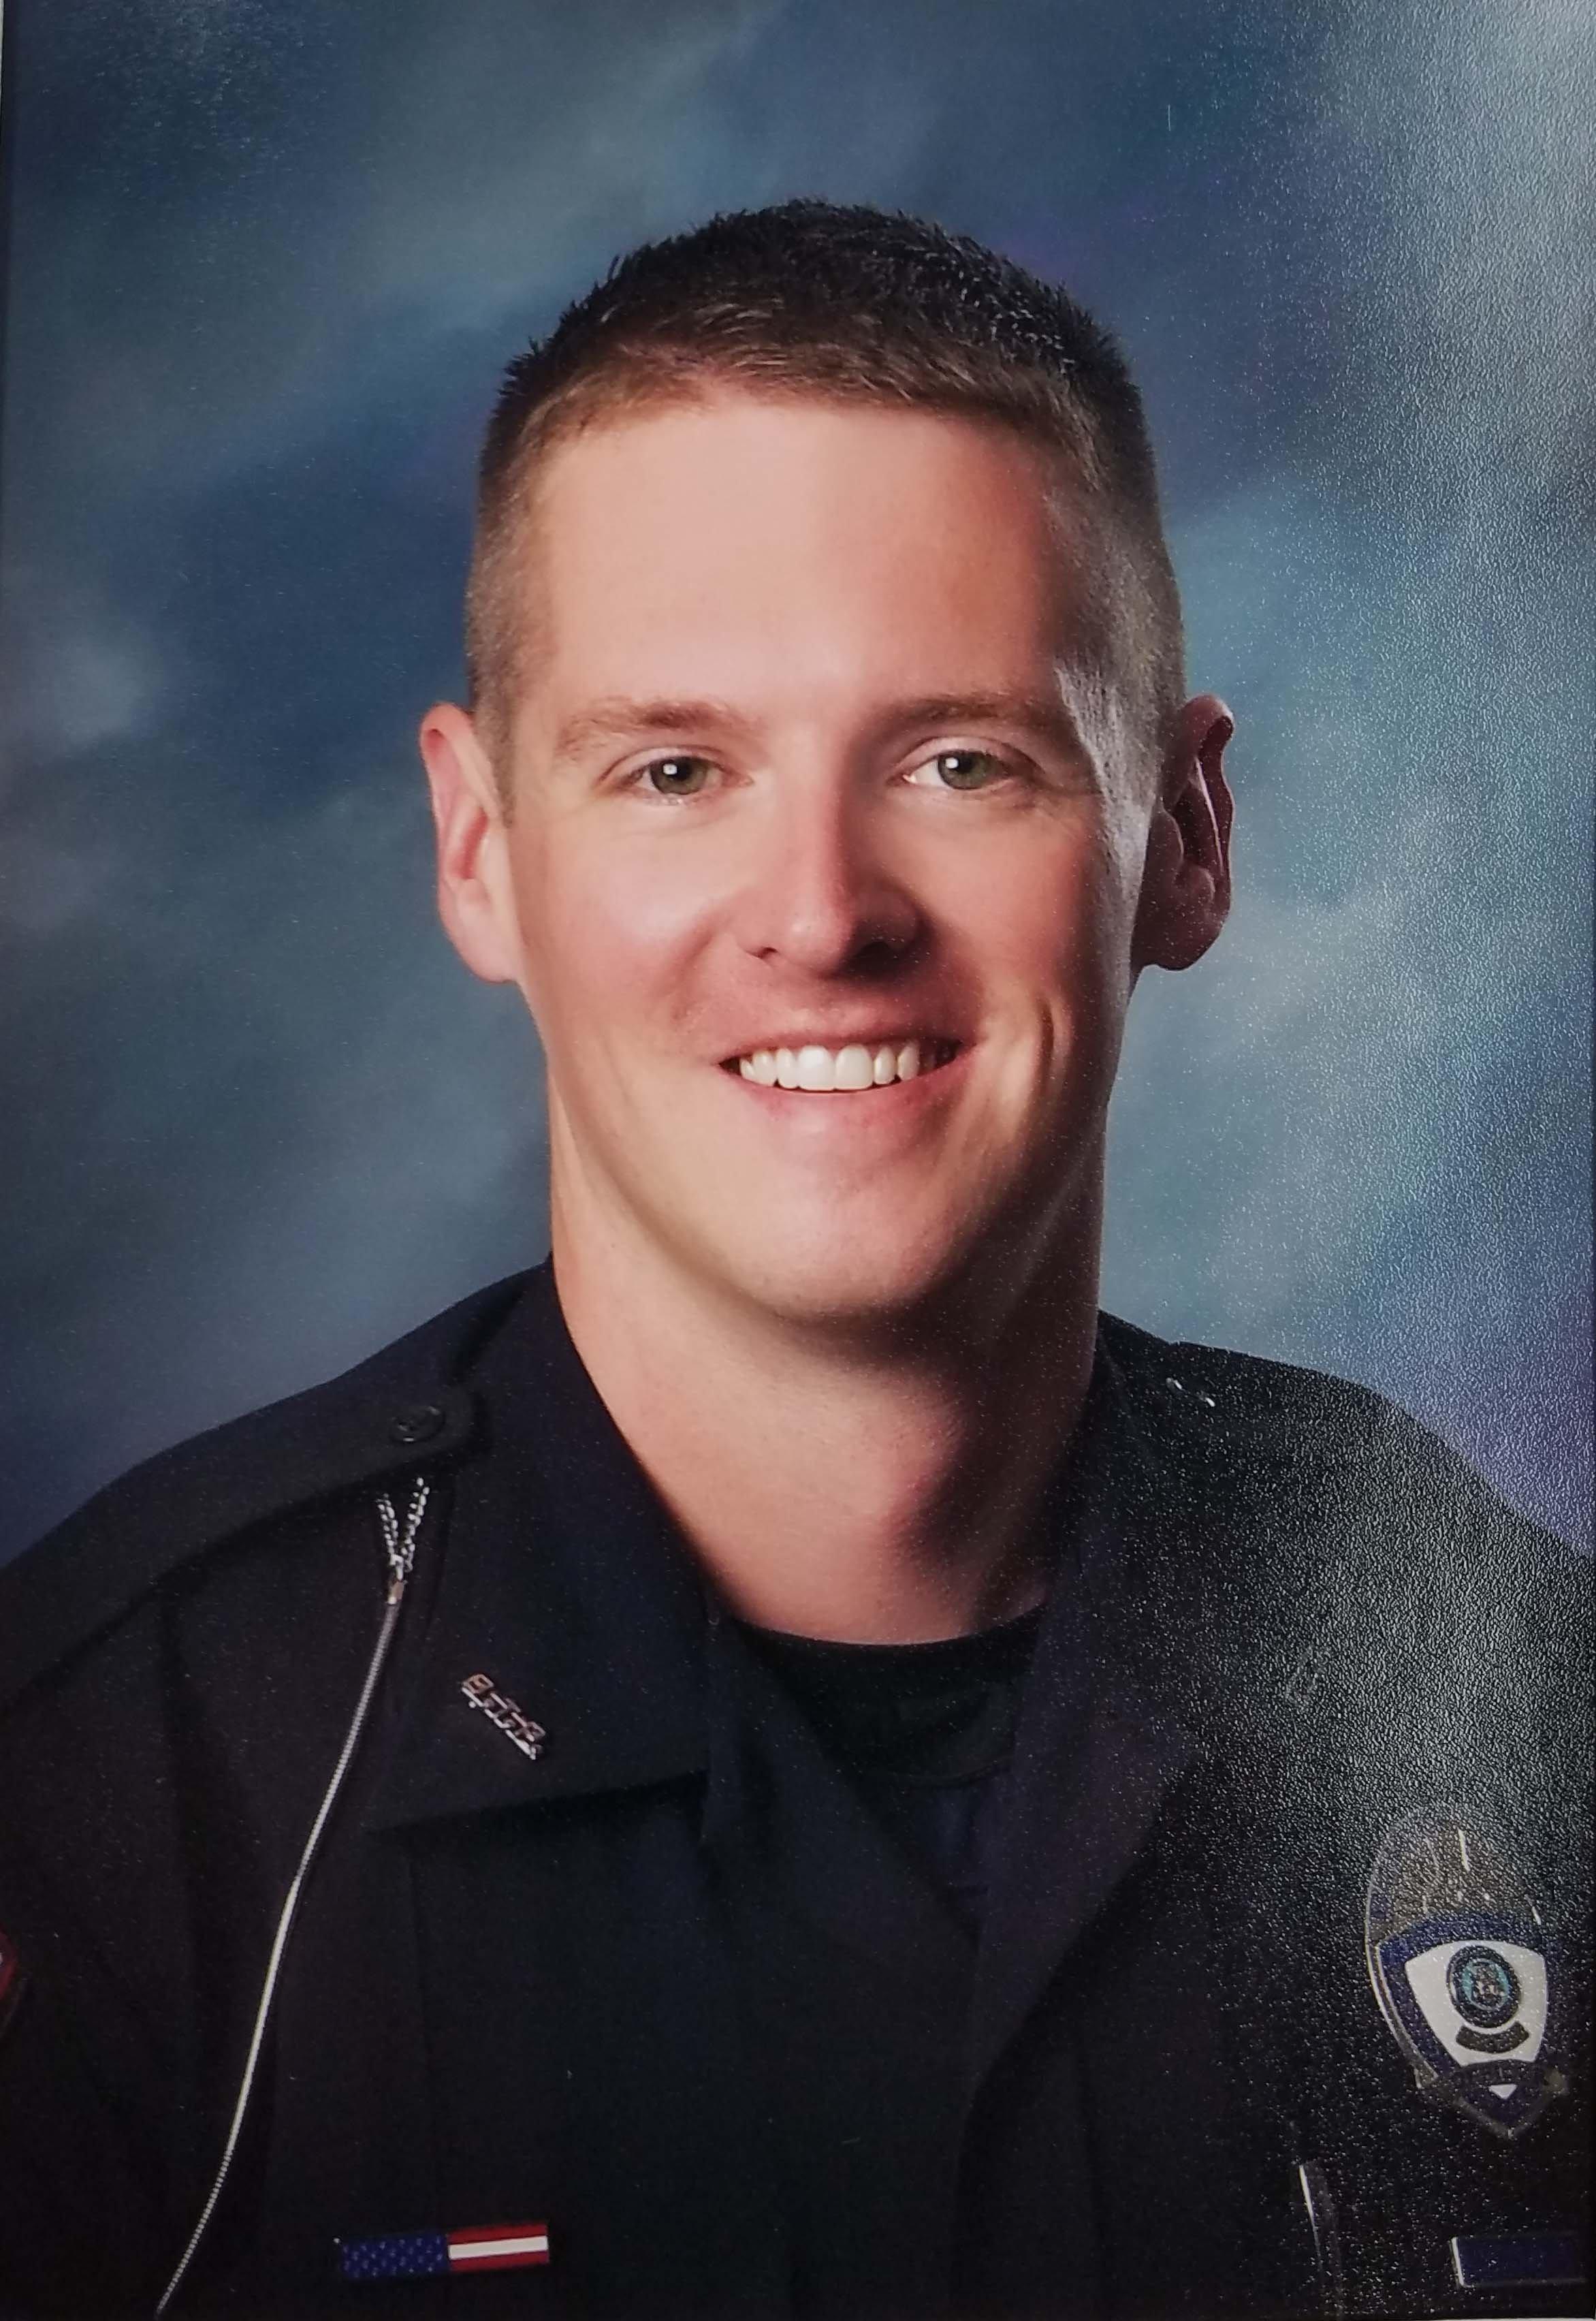 Eric Myczkowiak (Source: Bridgeport Twp. Police Dept.)